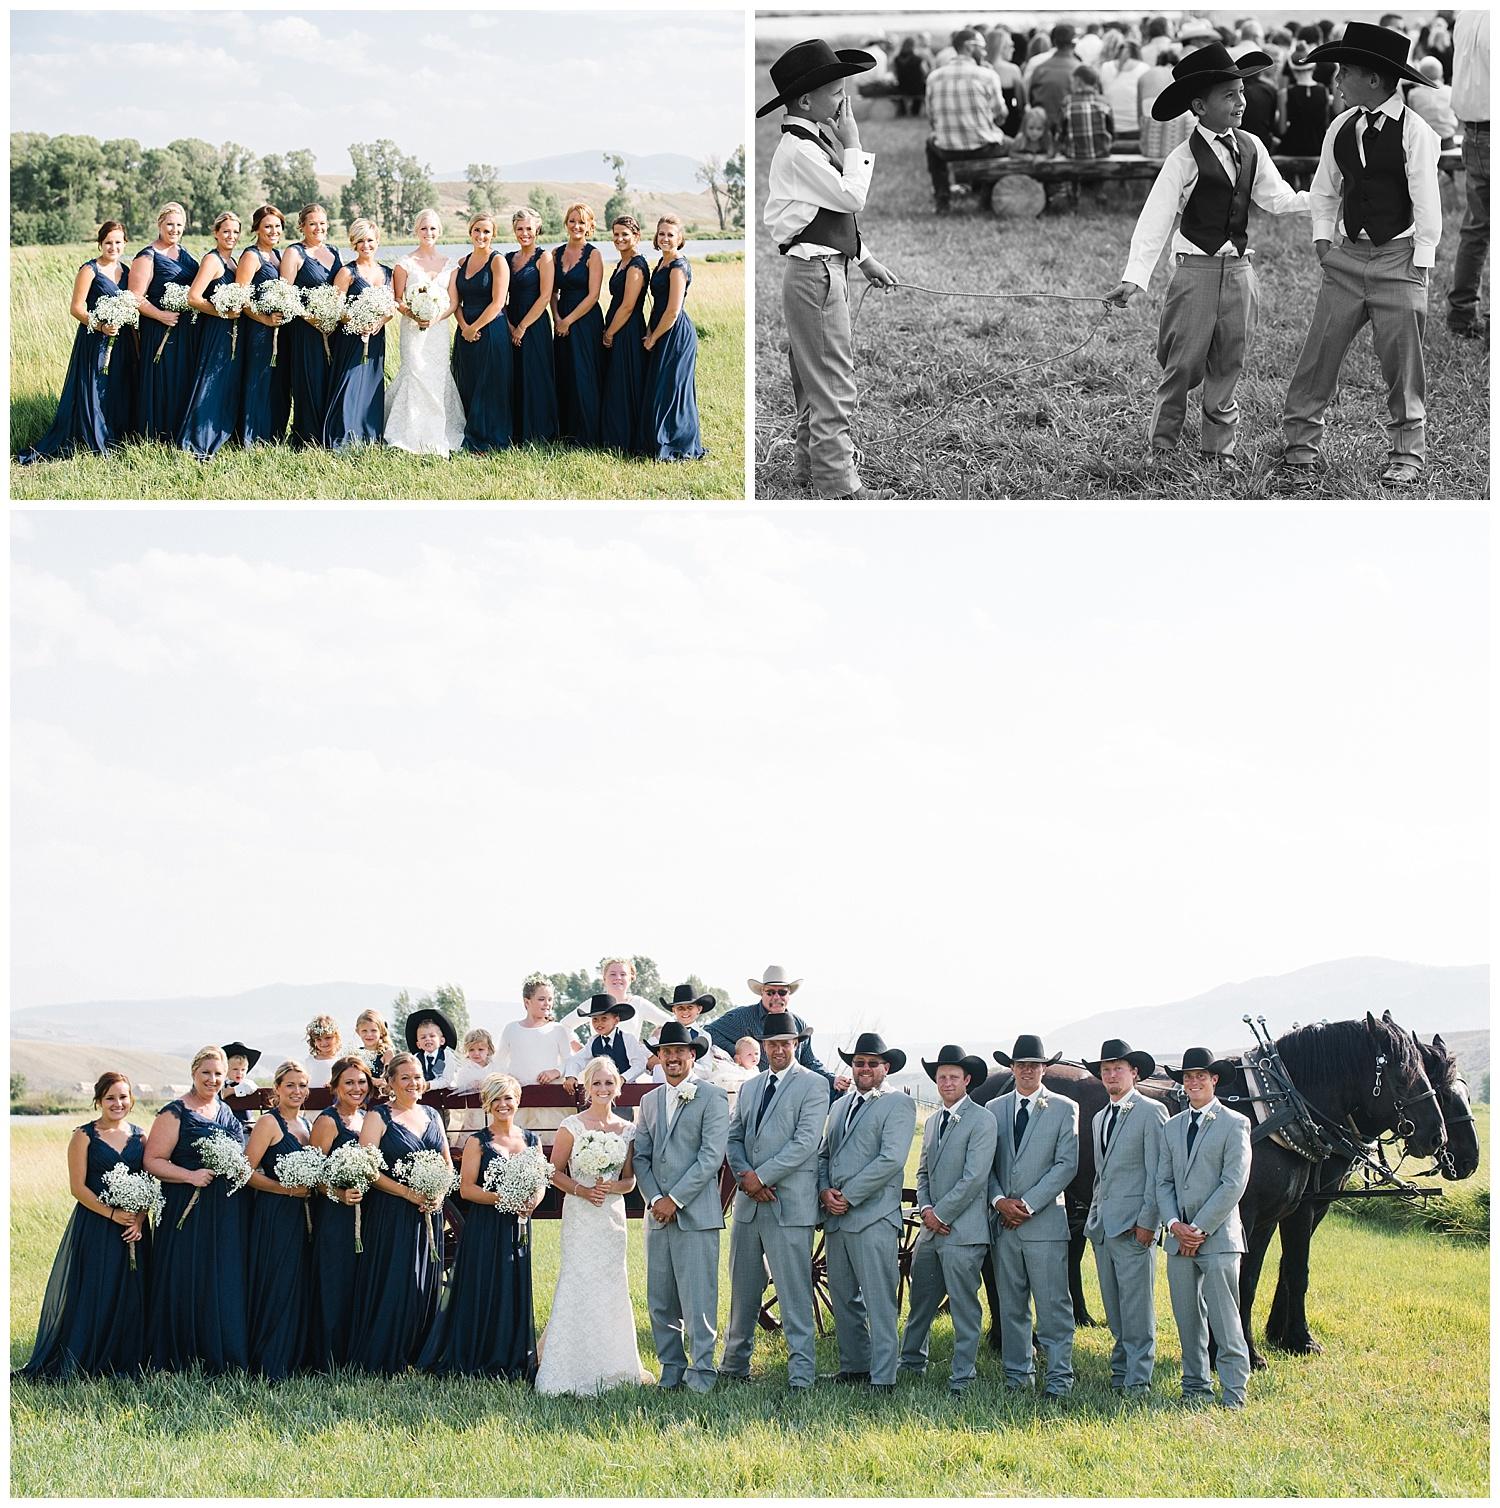 Kremmling CO Ranch Wedding by Caitlin Steuben Photography7.jpg